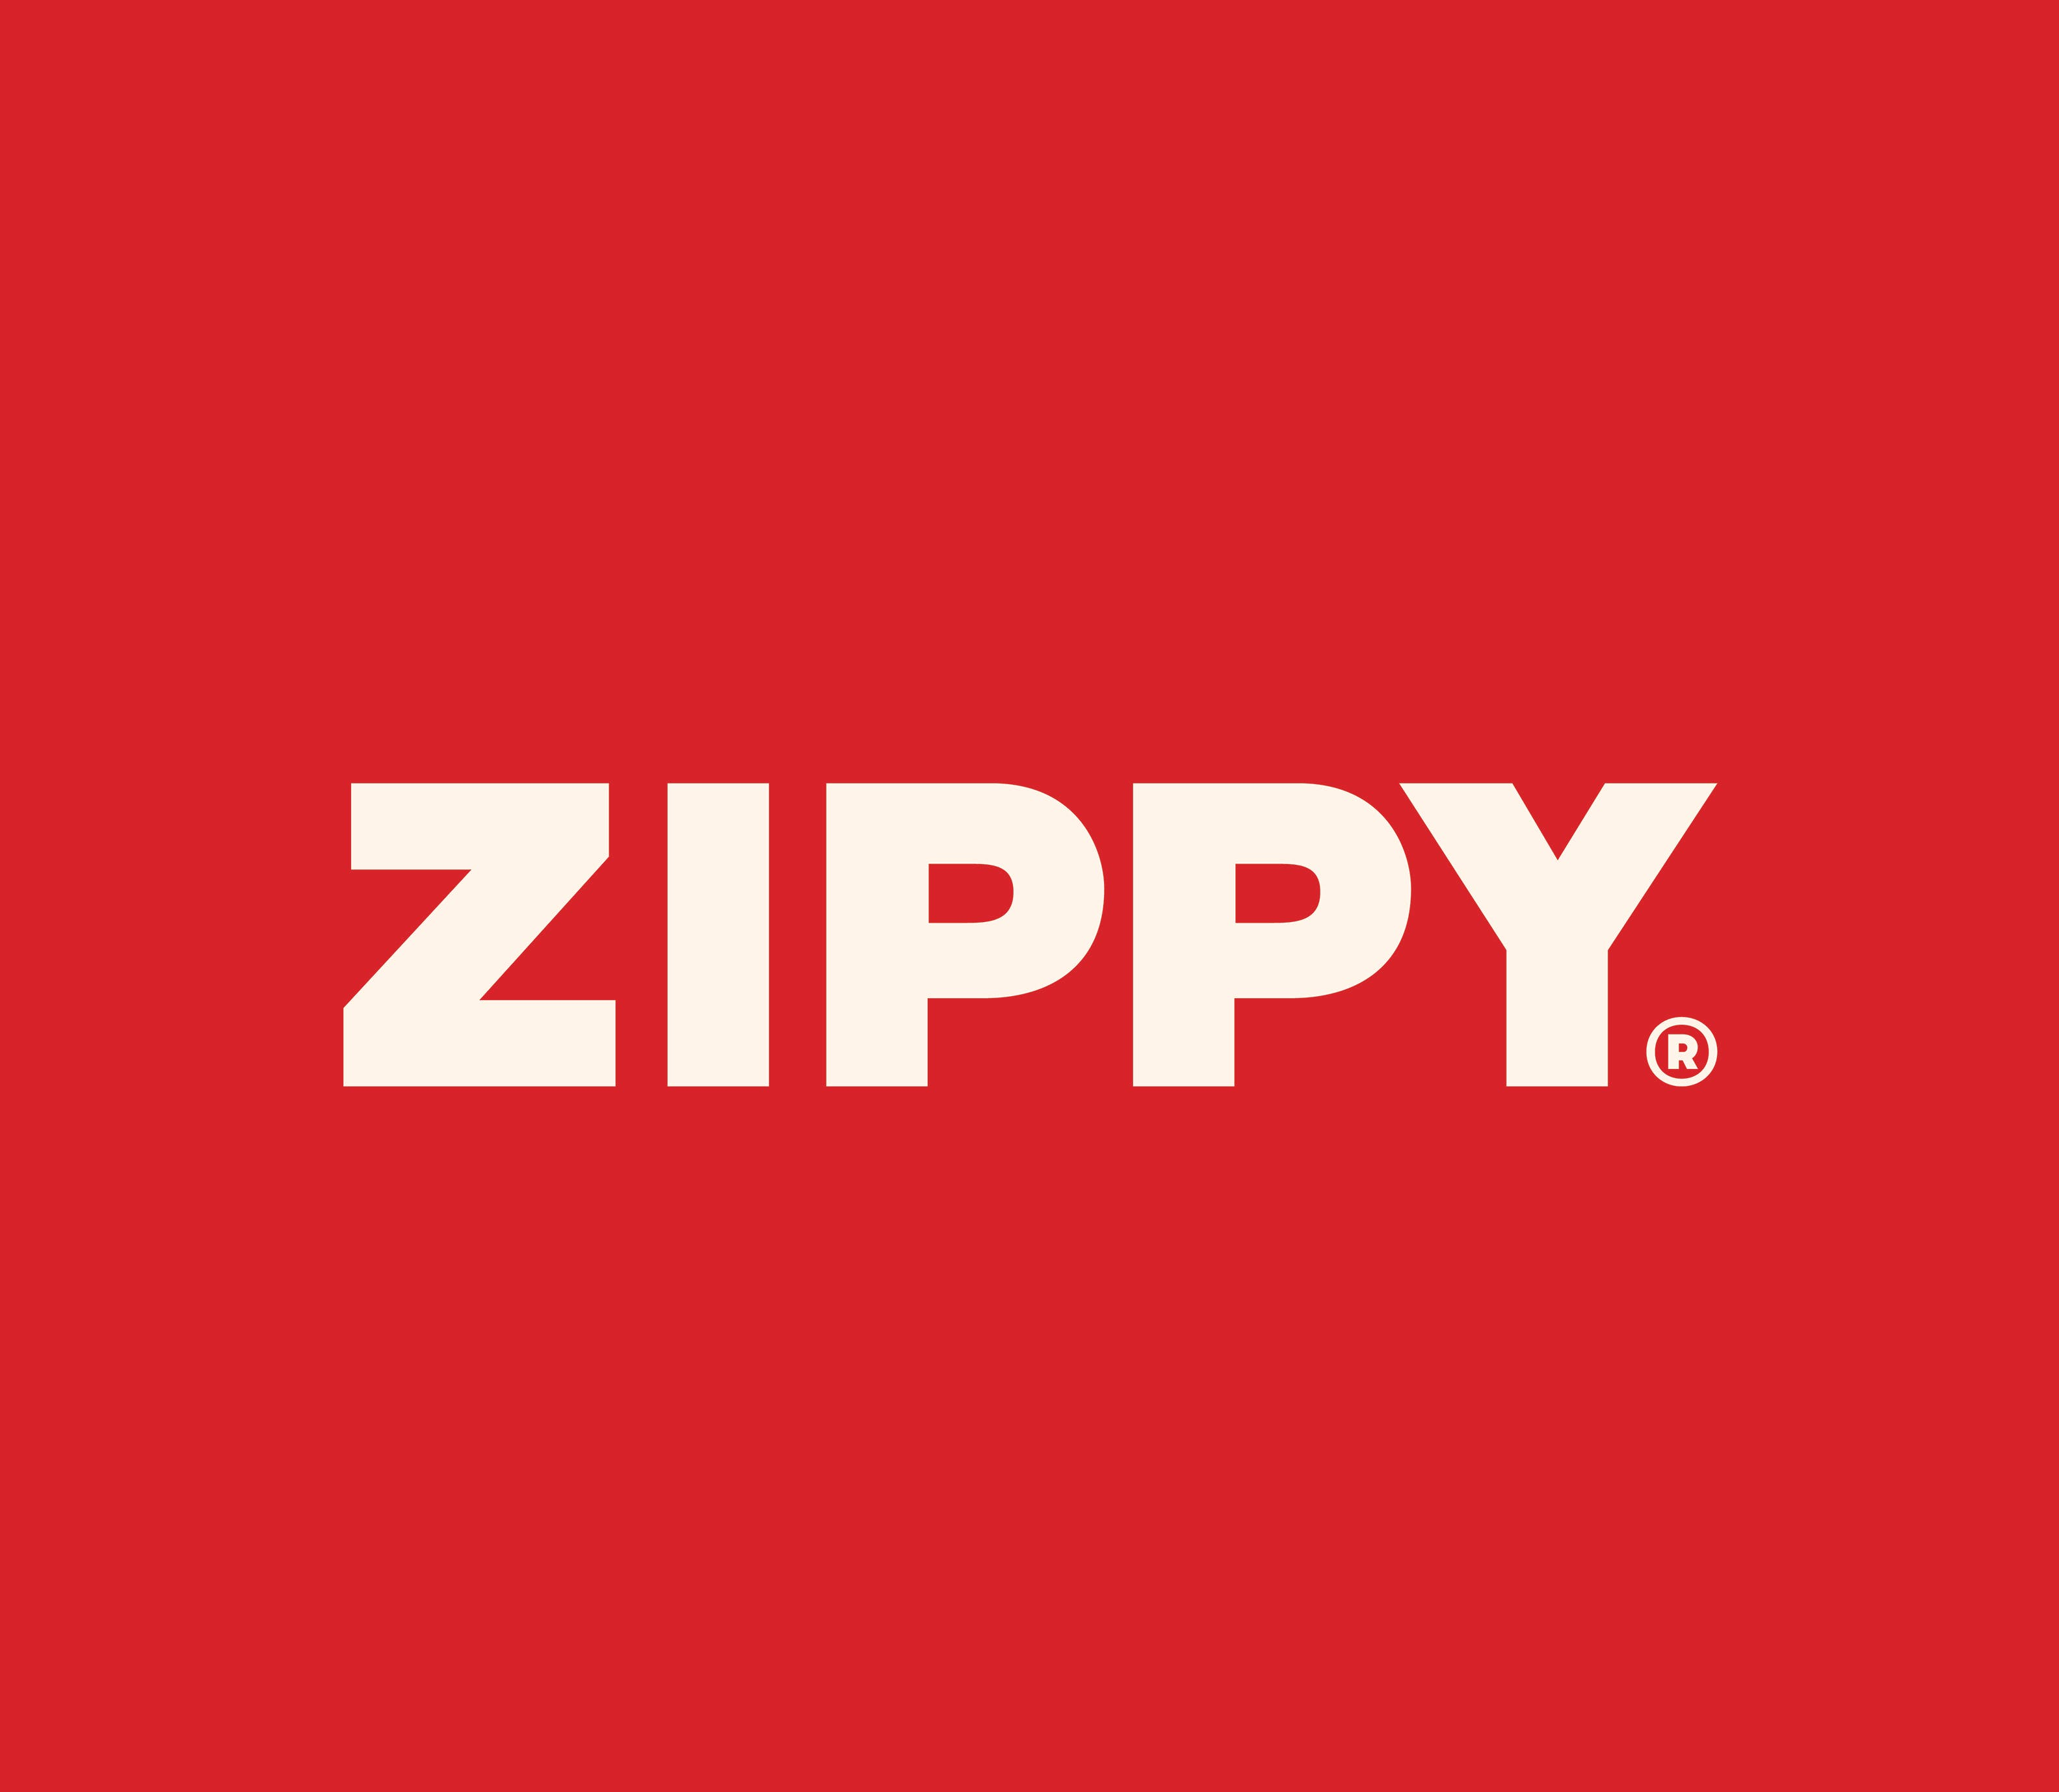 Zippy_Logos_PANT_CMYK_MONO_CS5